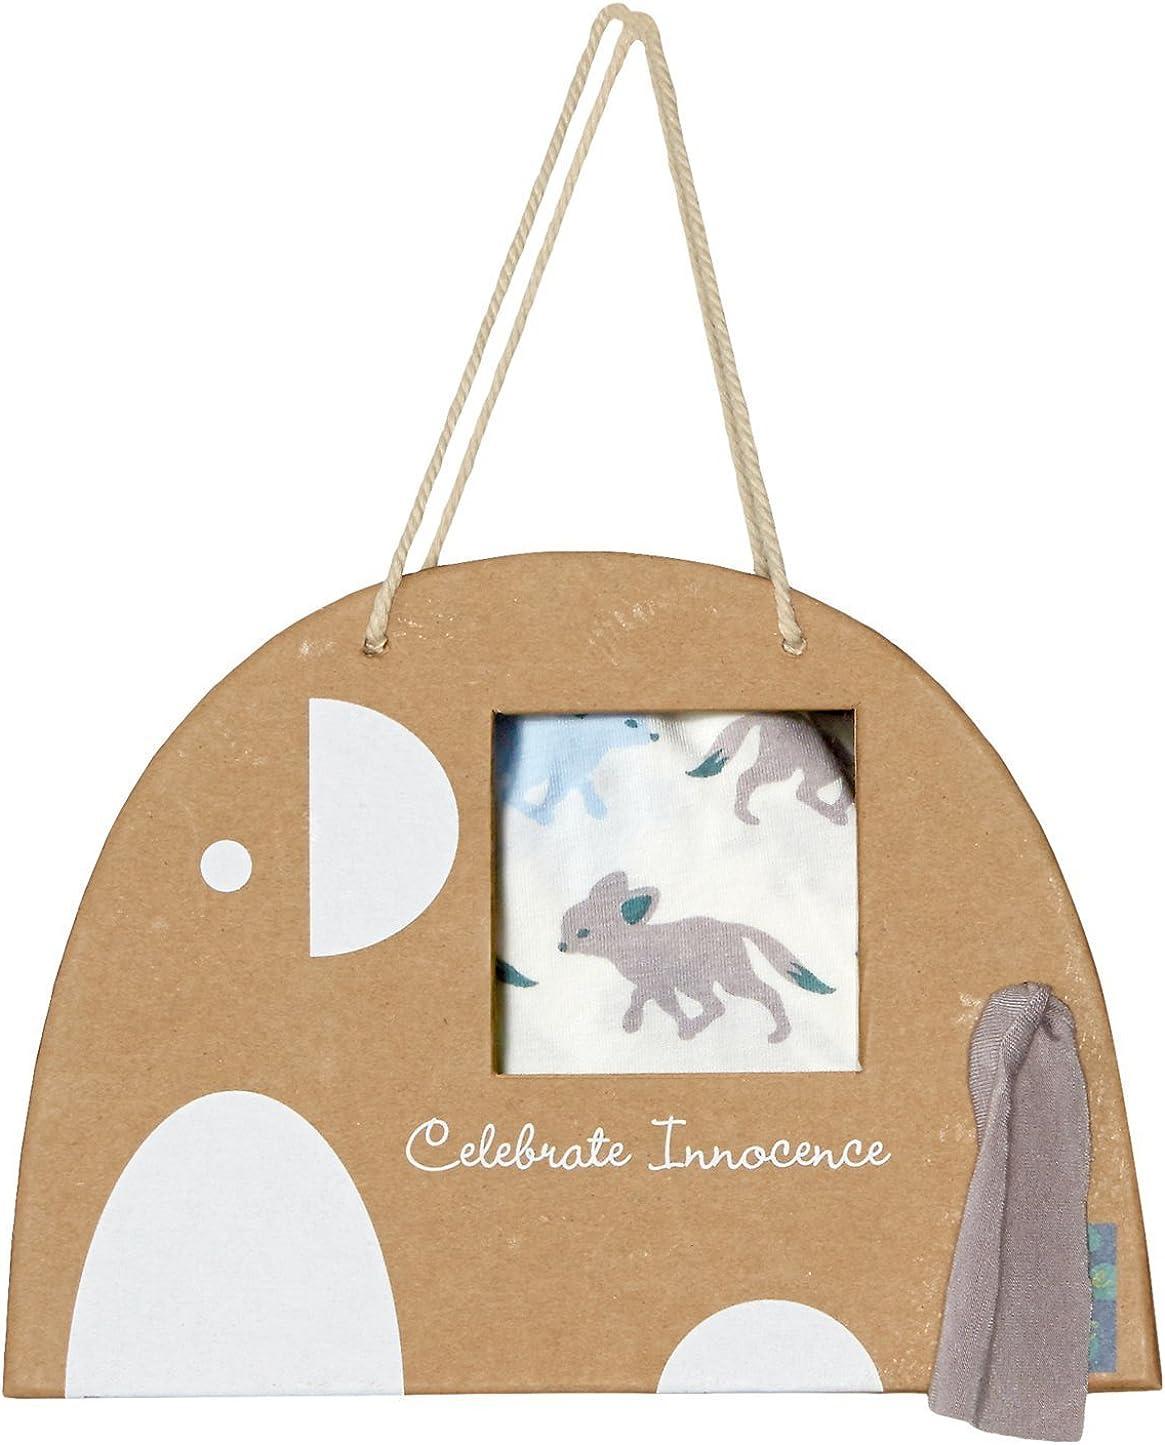 Kic Kee Pants Baby Boys Kimono Newborn Gift Set W//Elephant Box Prd-kpkgsb152-ndf